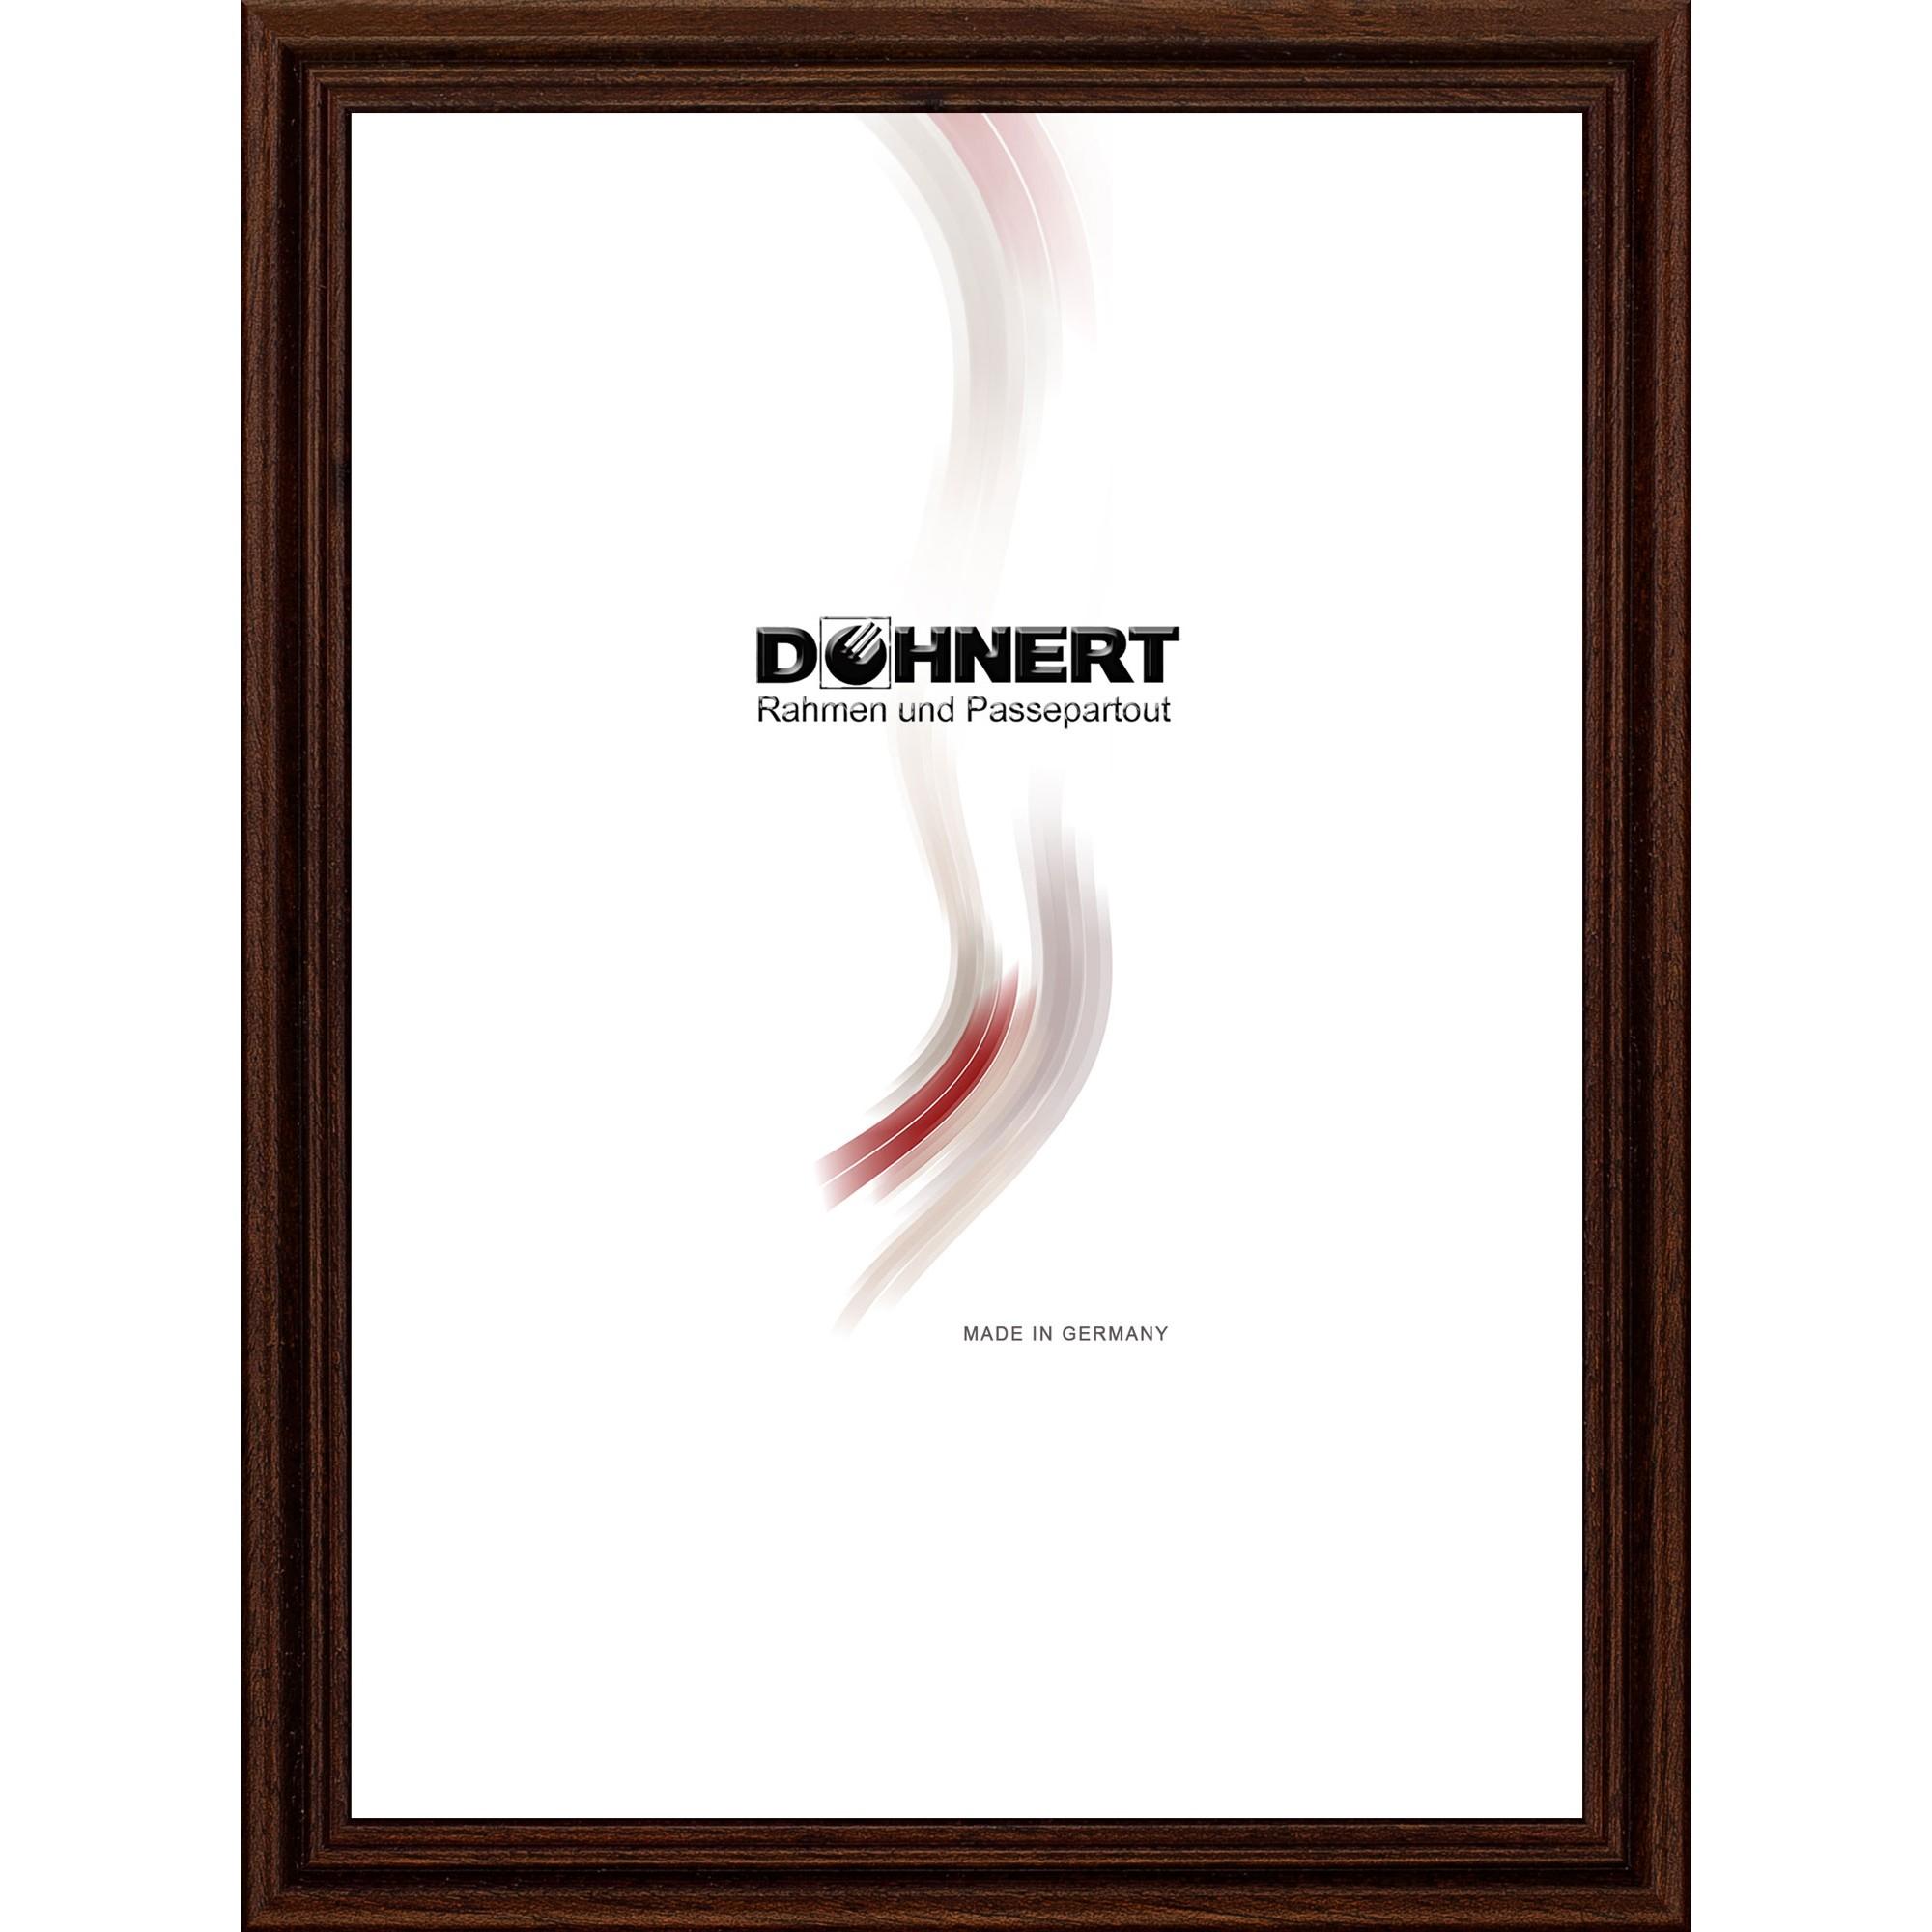 Cornice in legno Barkingside 9x13 cm | marrone scuro | vetro standarde